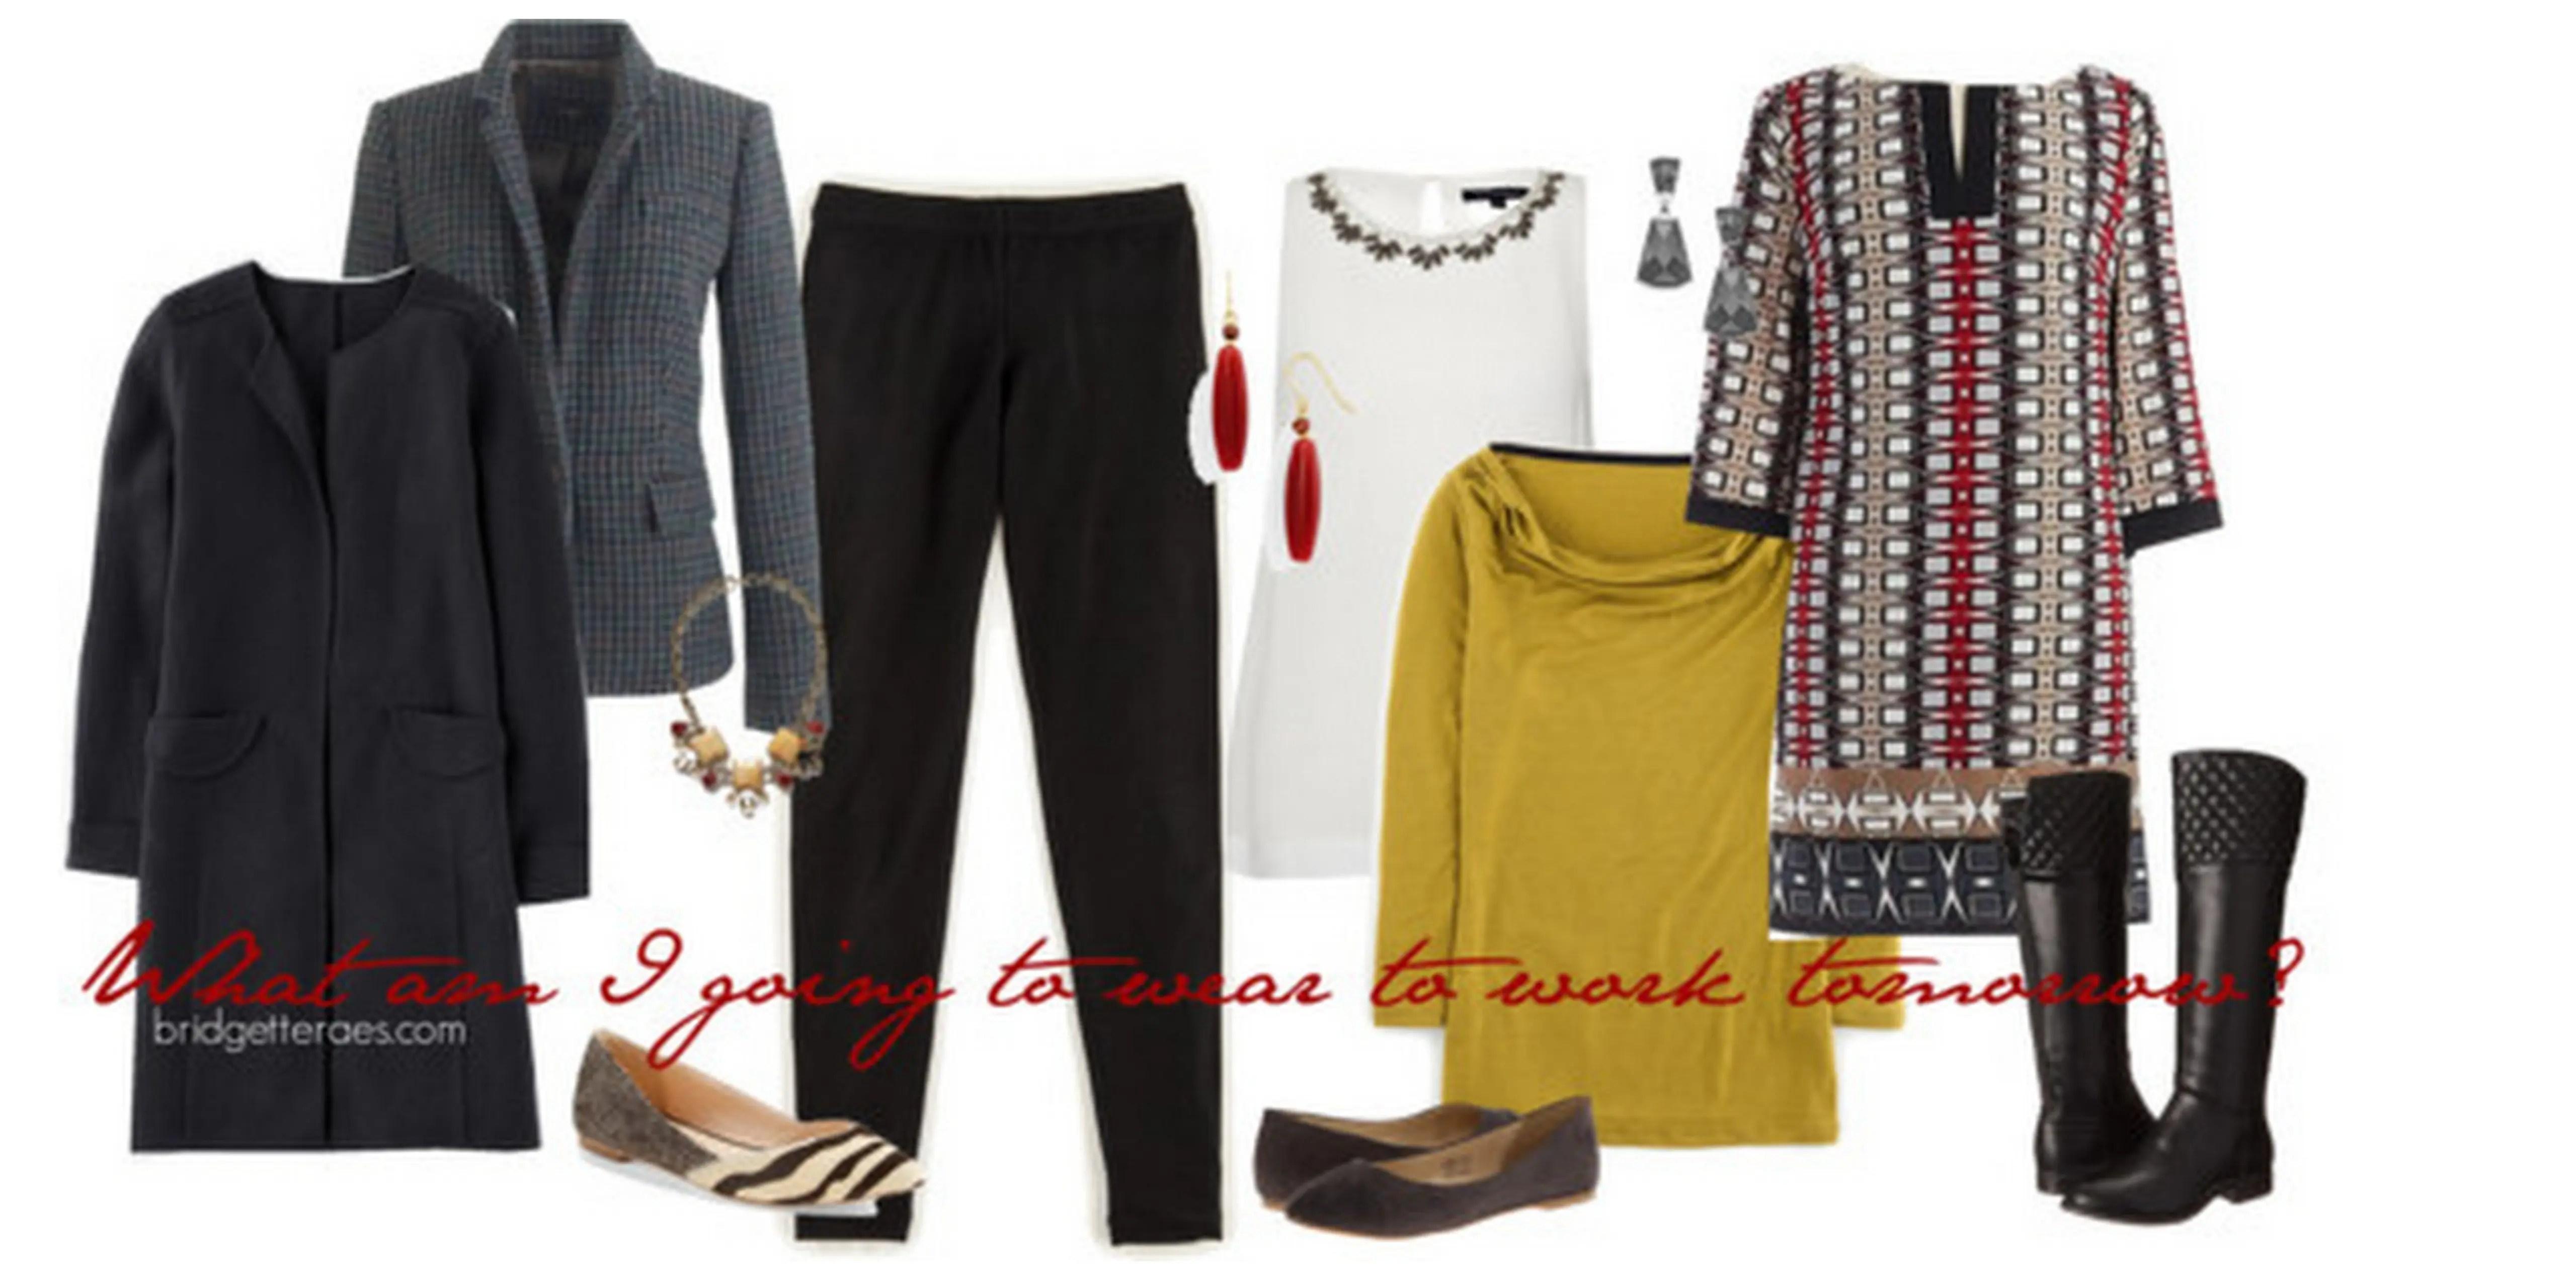 c70f54091cc62 How to wear leggings to work - Bridgette Raes Style Expert